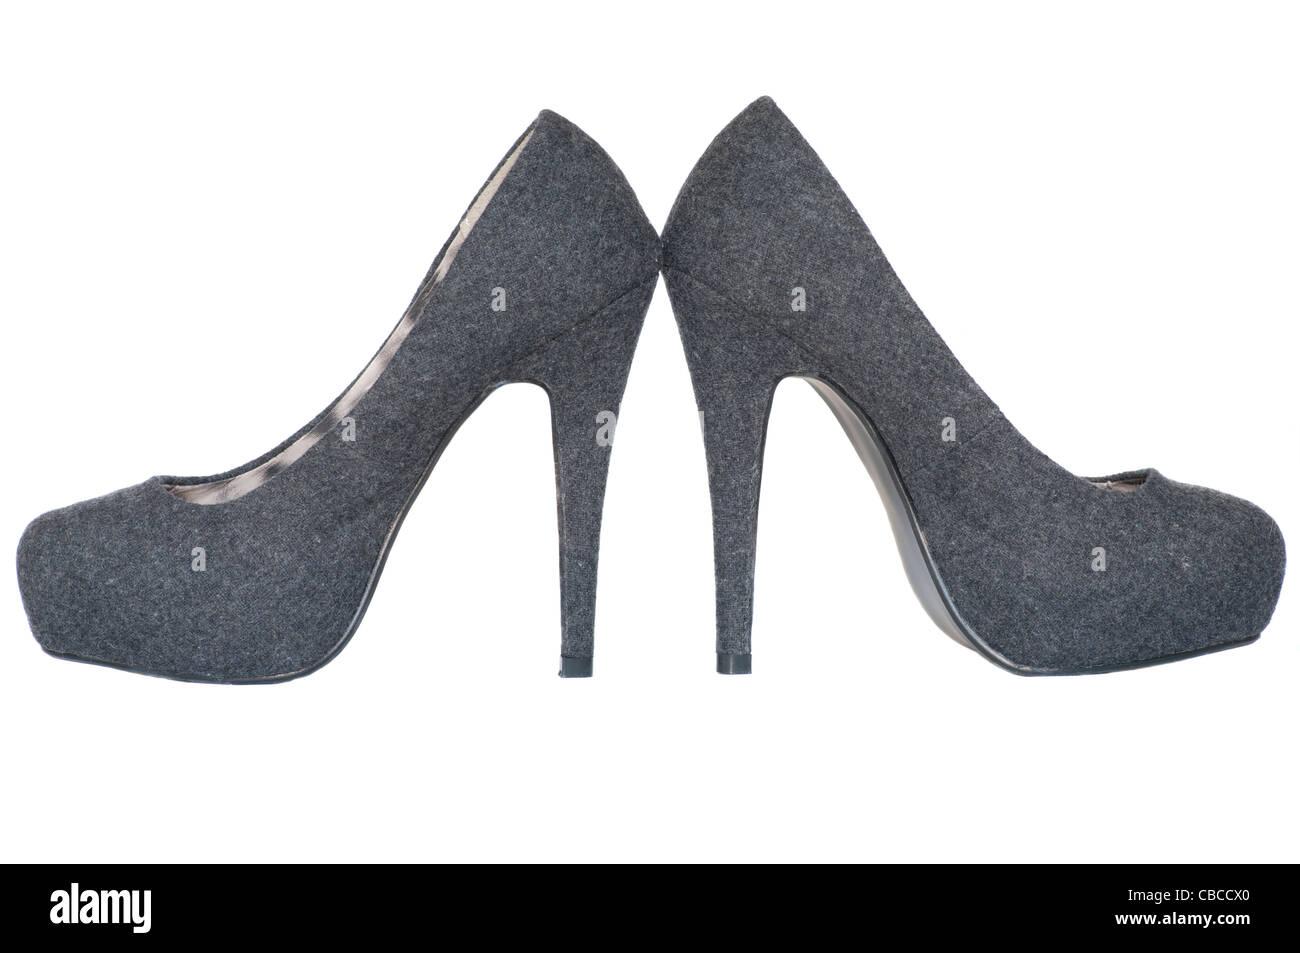 793b059b3f0 Ladies Black High Heels Stock Photos & Ladies Black High Heels Stock ...